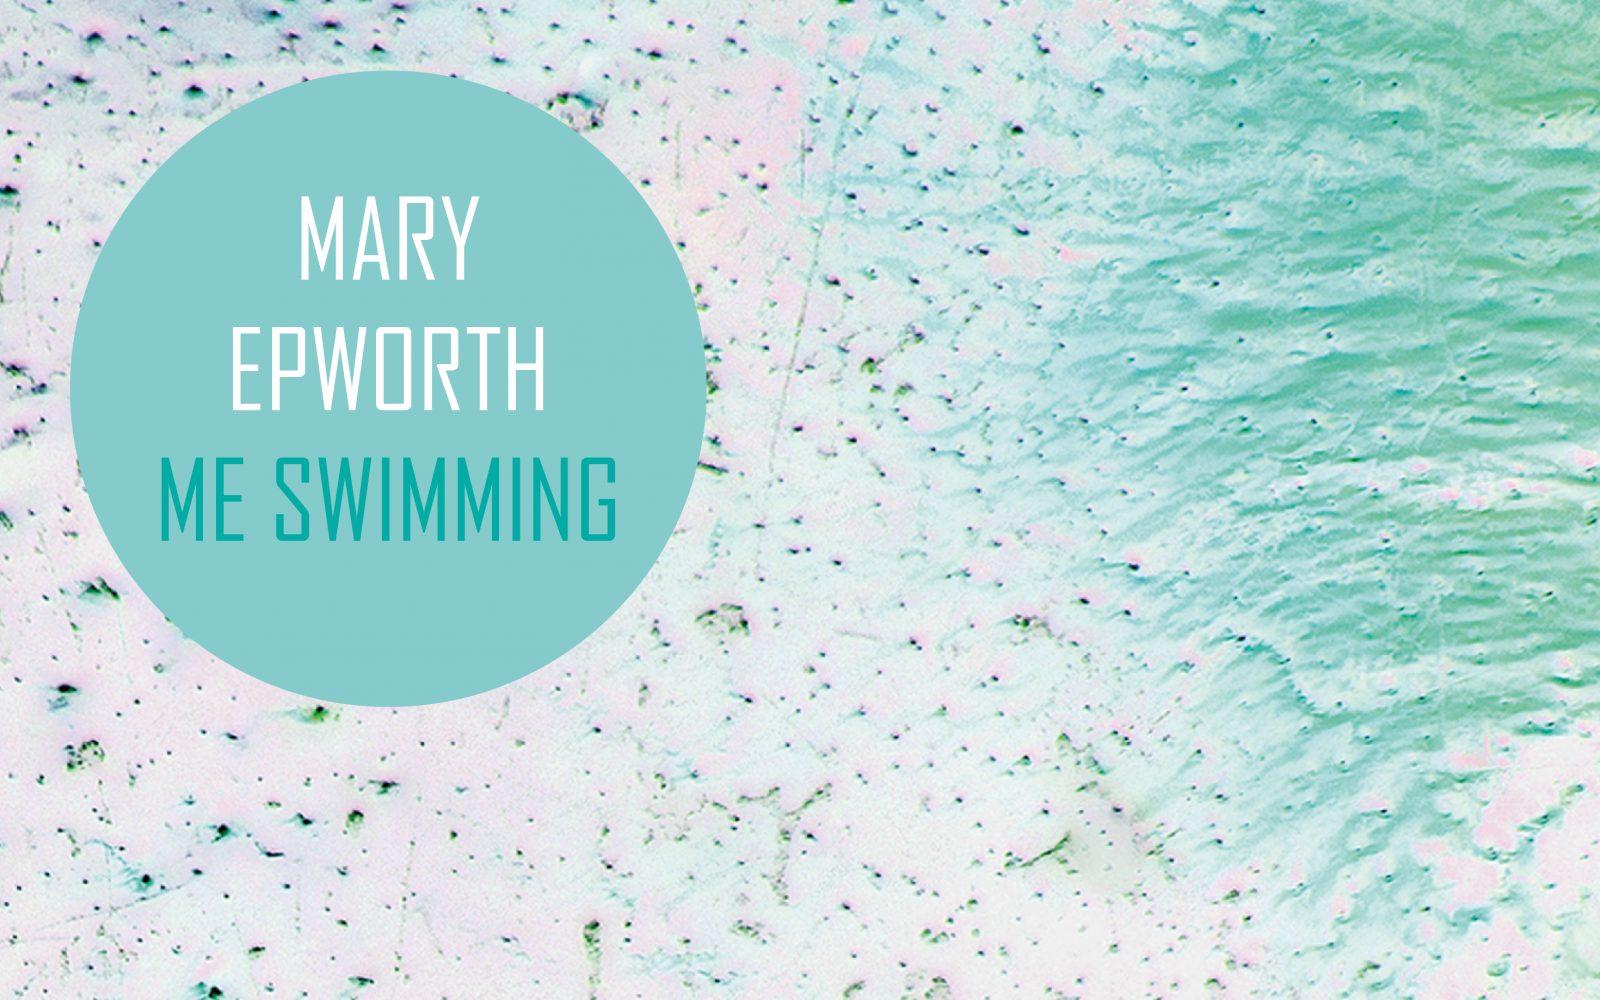 Mary-Epworth-Me-Swimming-packshot-final